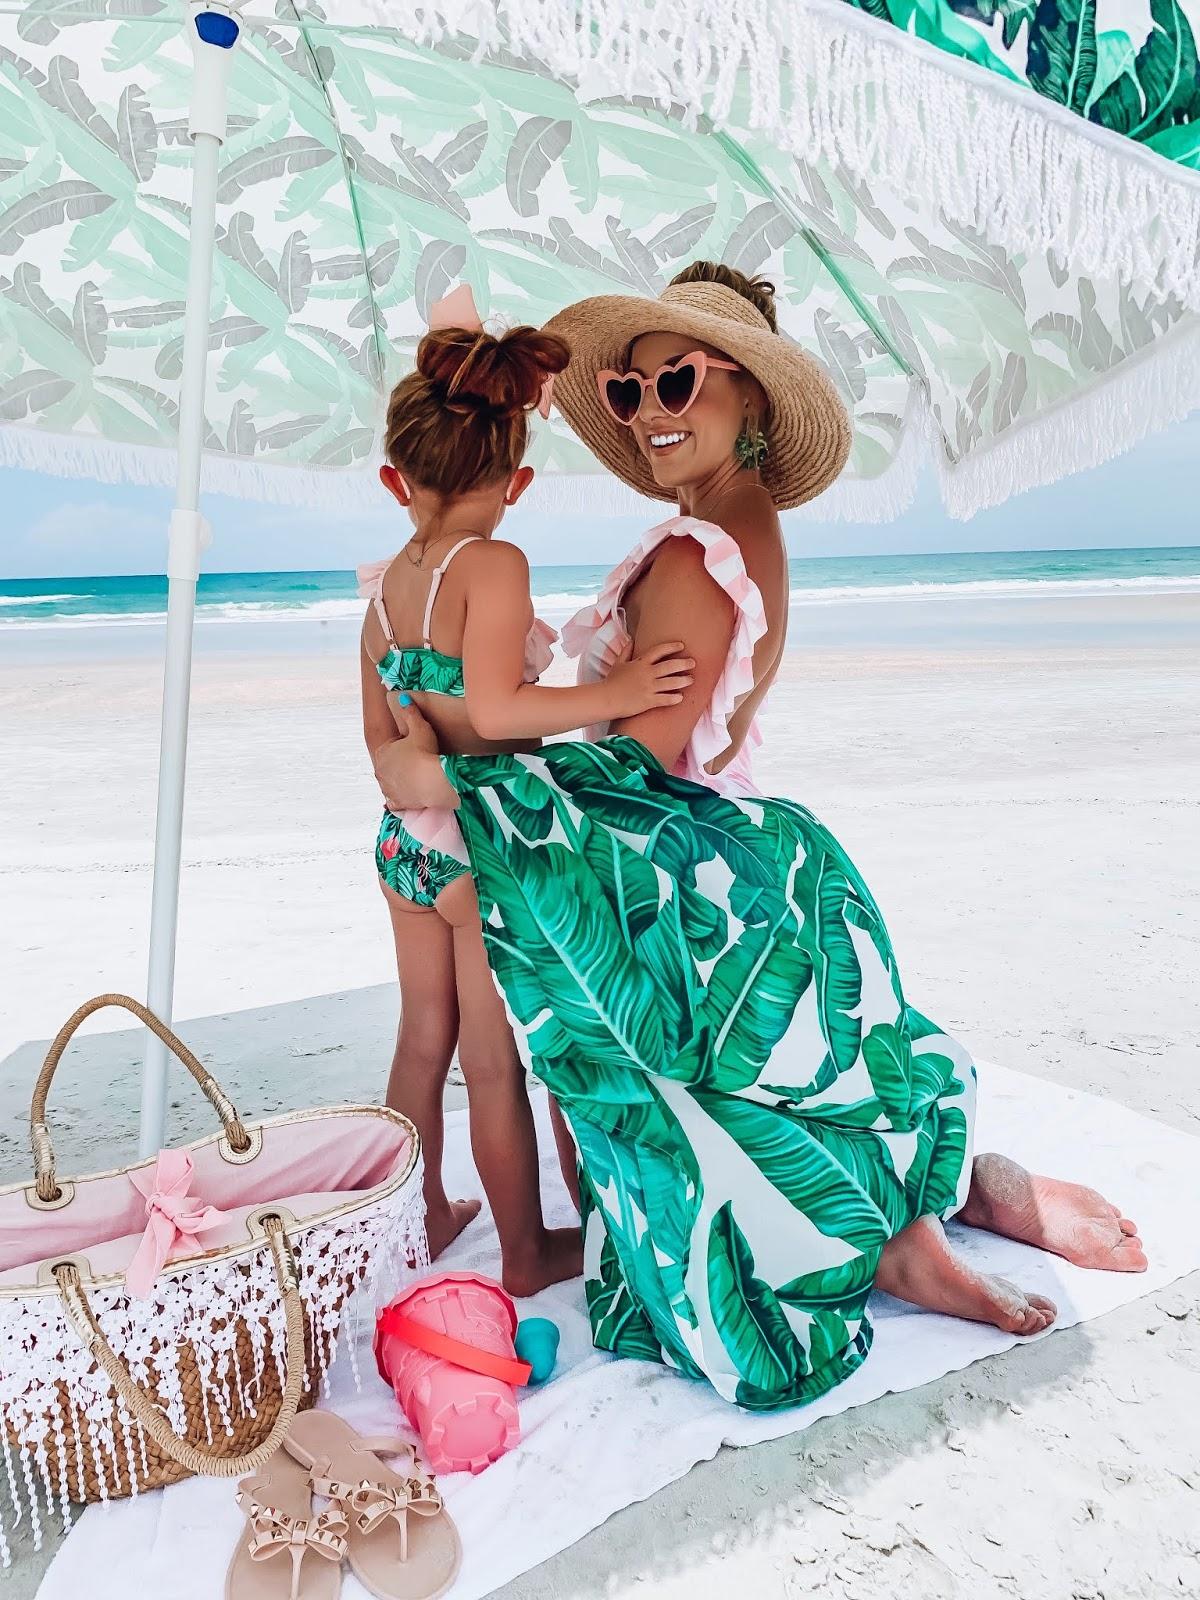 $40 Target Ruffle Back Swimsuit: Pink & White Stripes + Palm Print, Beach Style - Something Delightful Blog